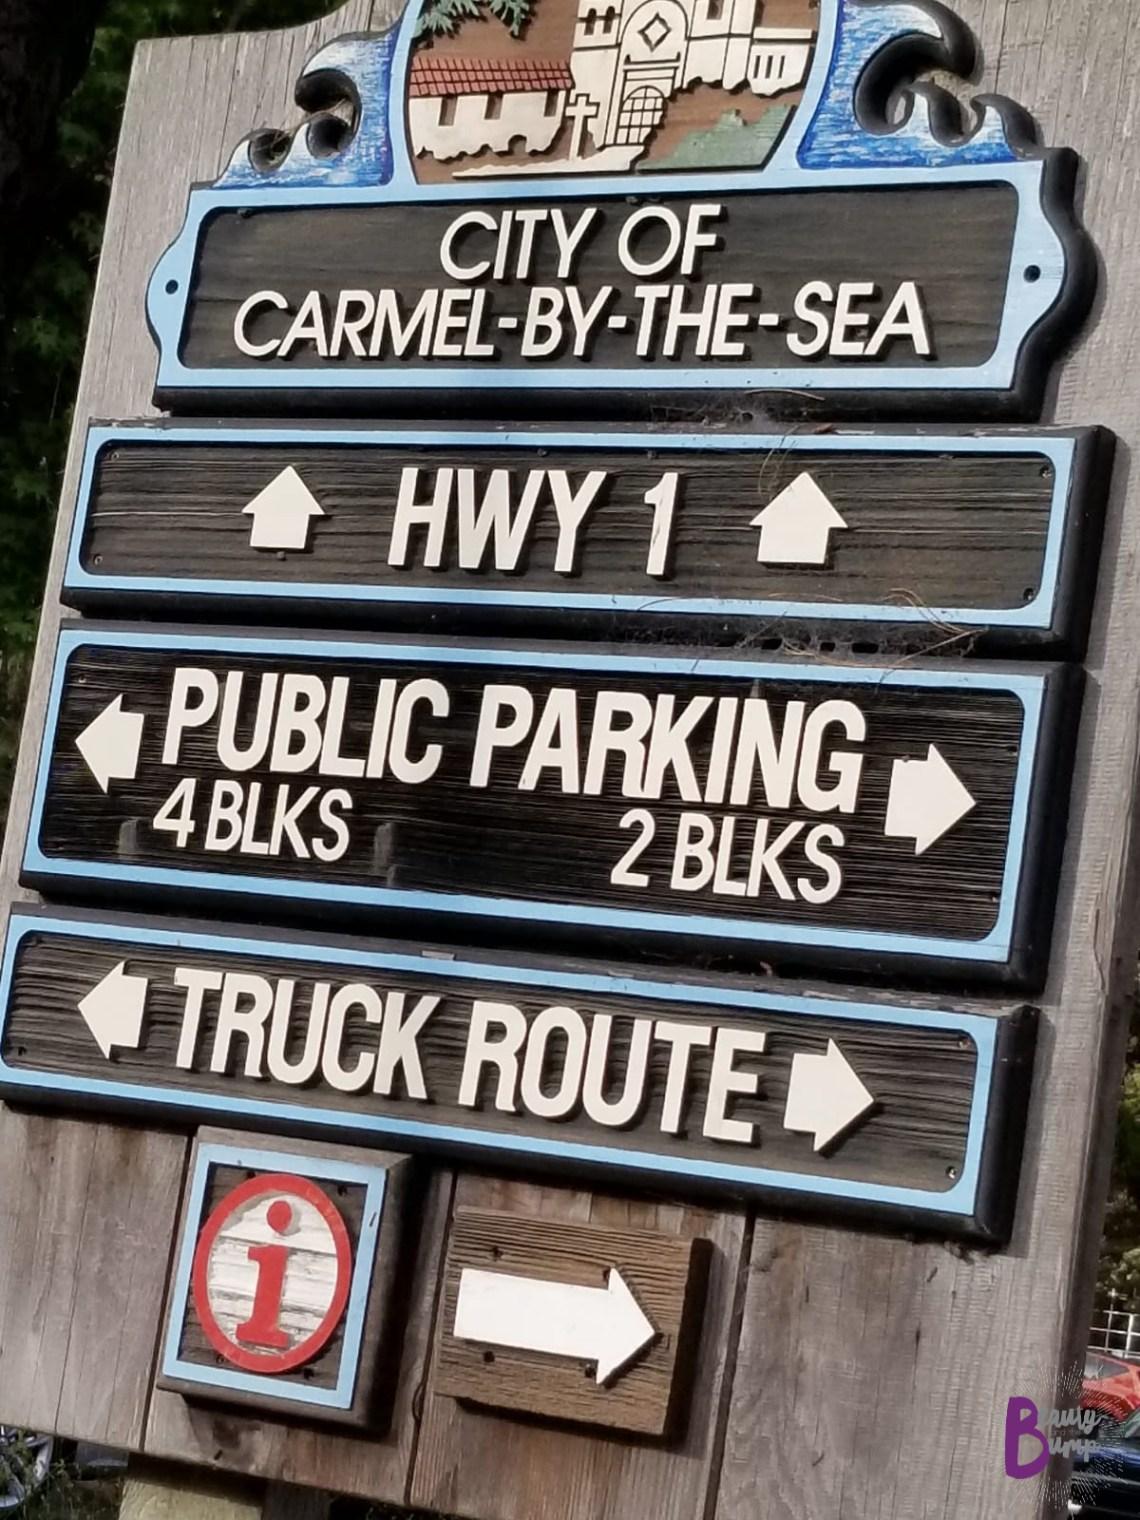 Carmel-by-the-sea Monterey County, California